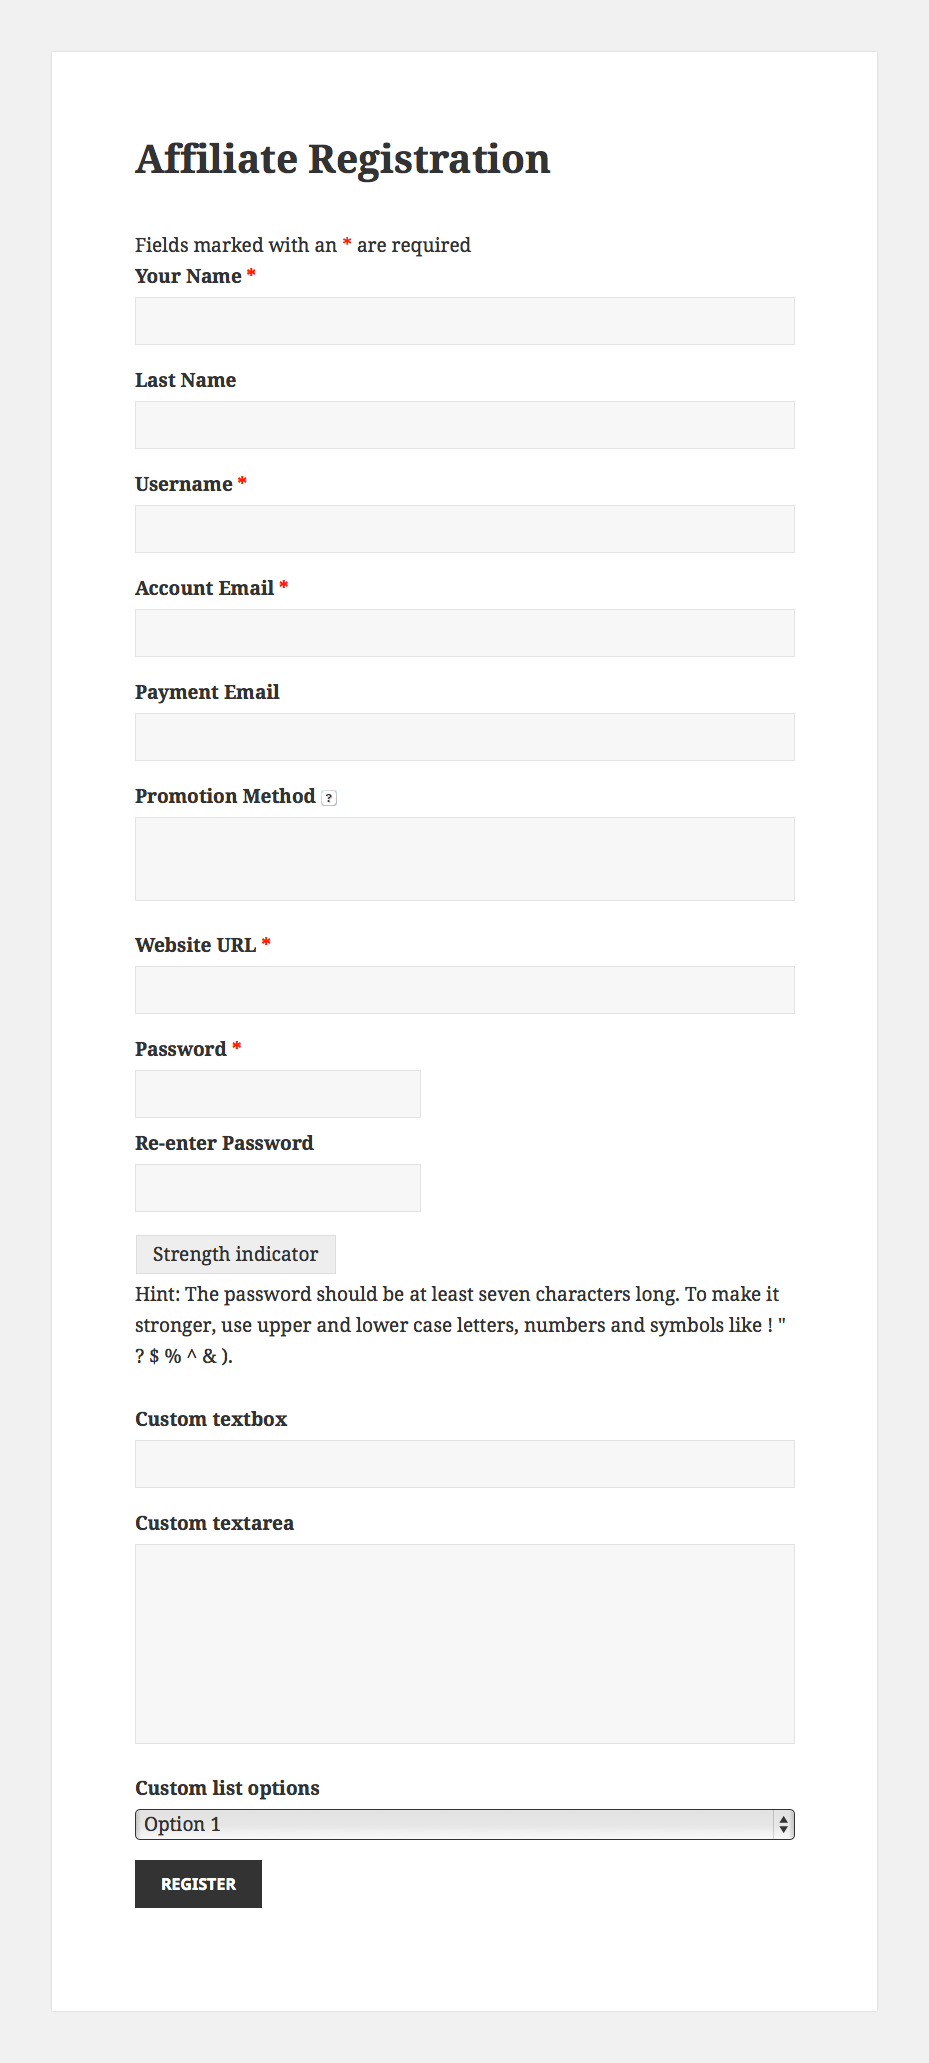 Create an advanced affiliate registration form using Ninja Forms